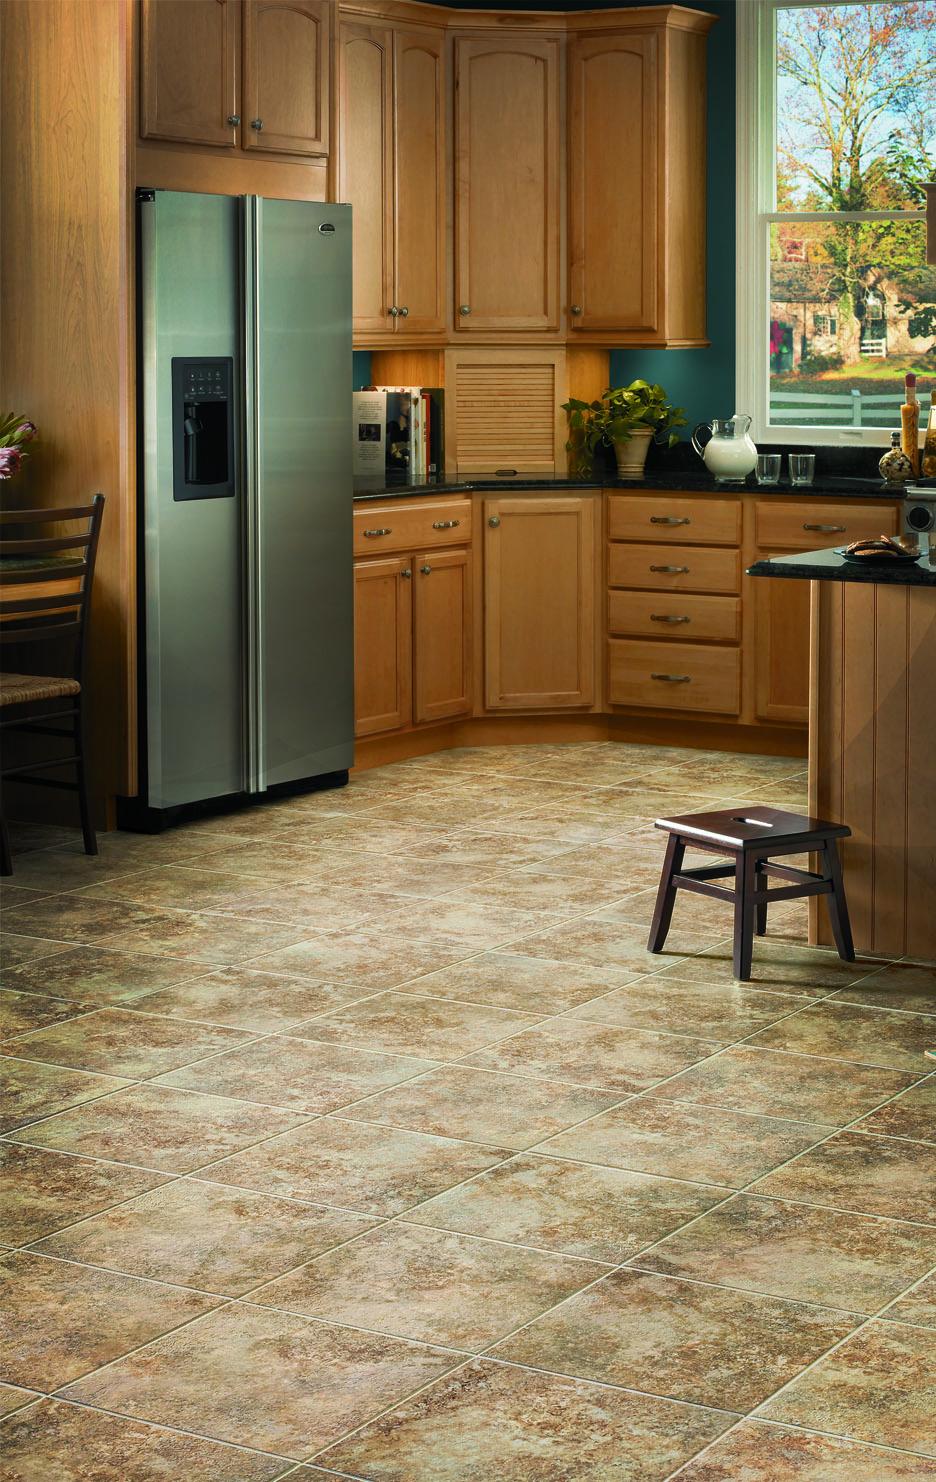 Vinyl Tile Flooring : Vinyl floor tiles flooring installation